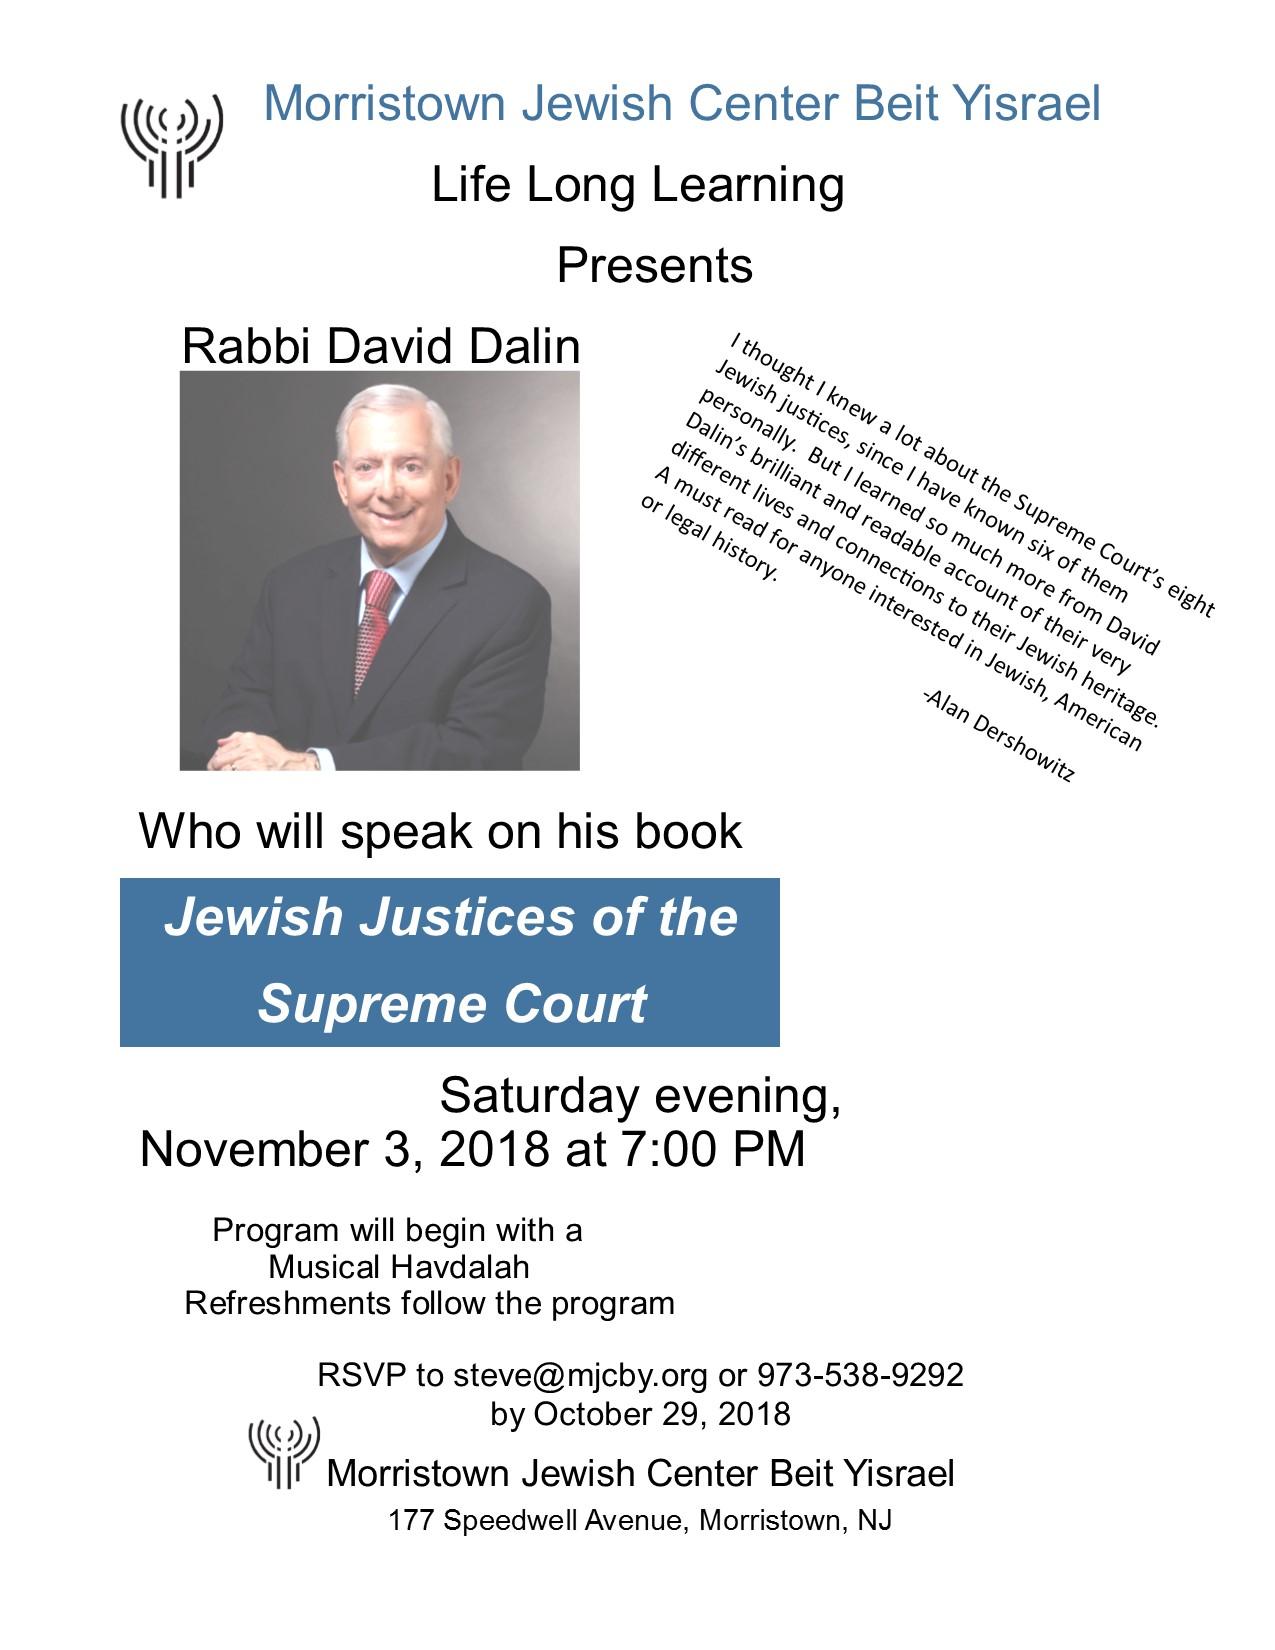 Jewish-Justices-11-03-18